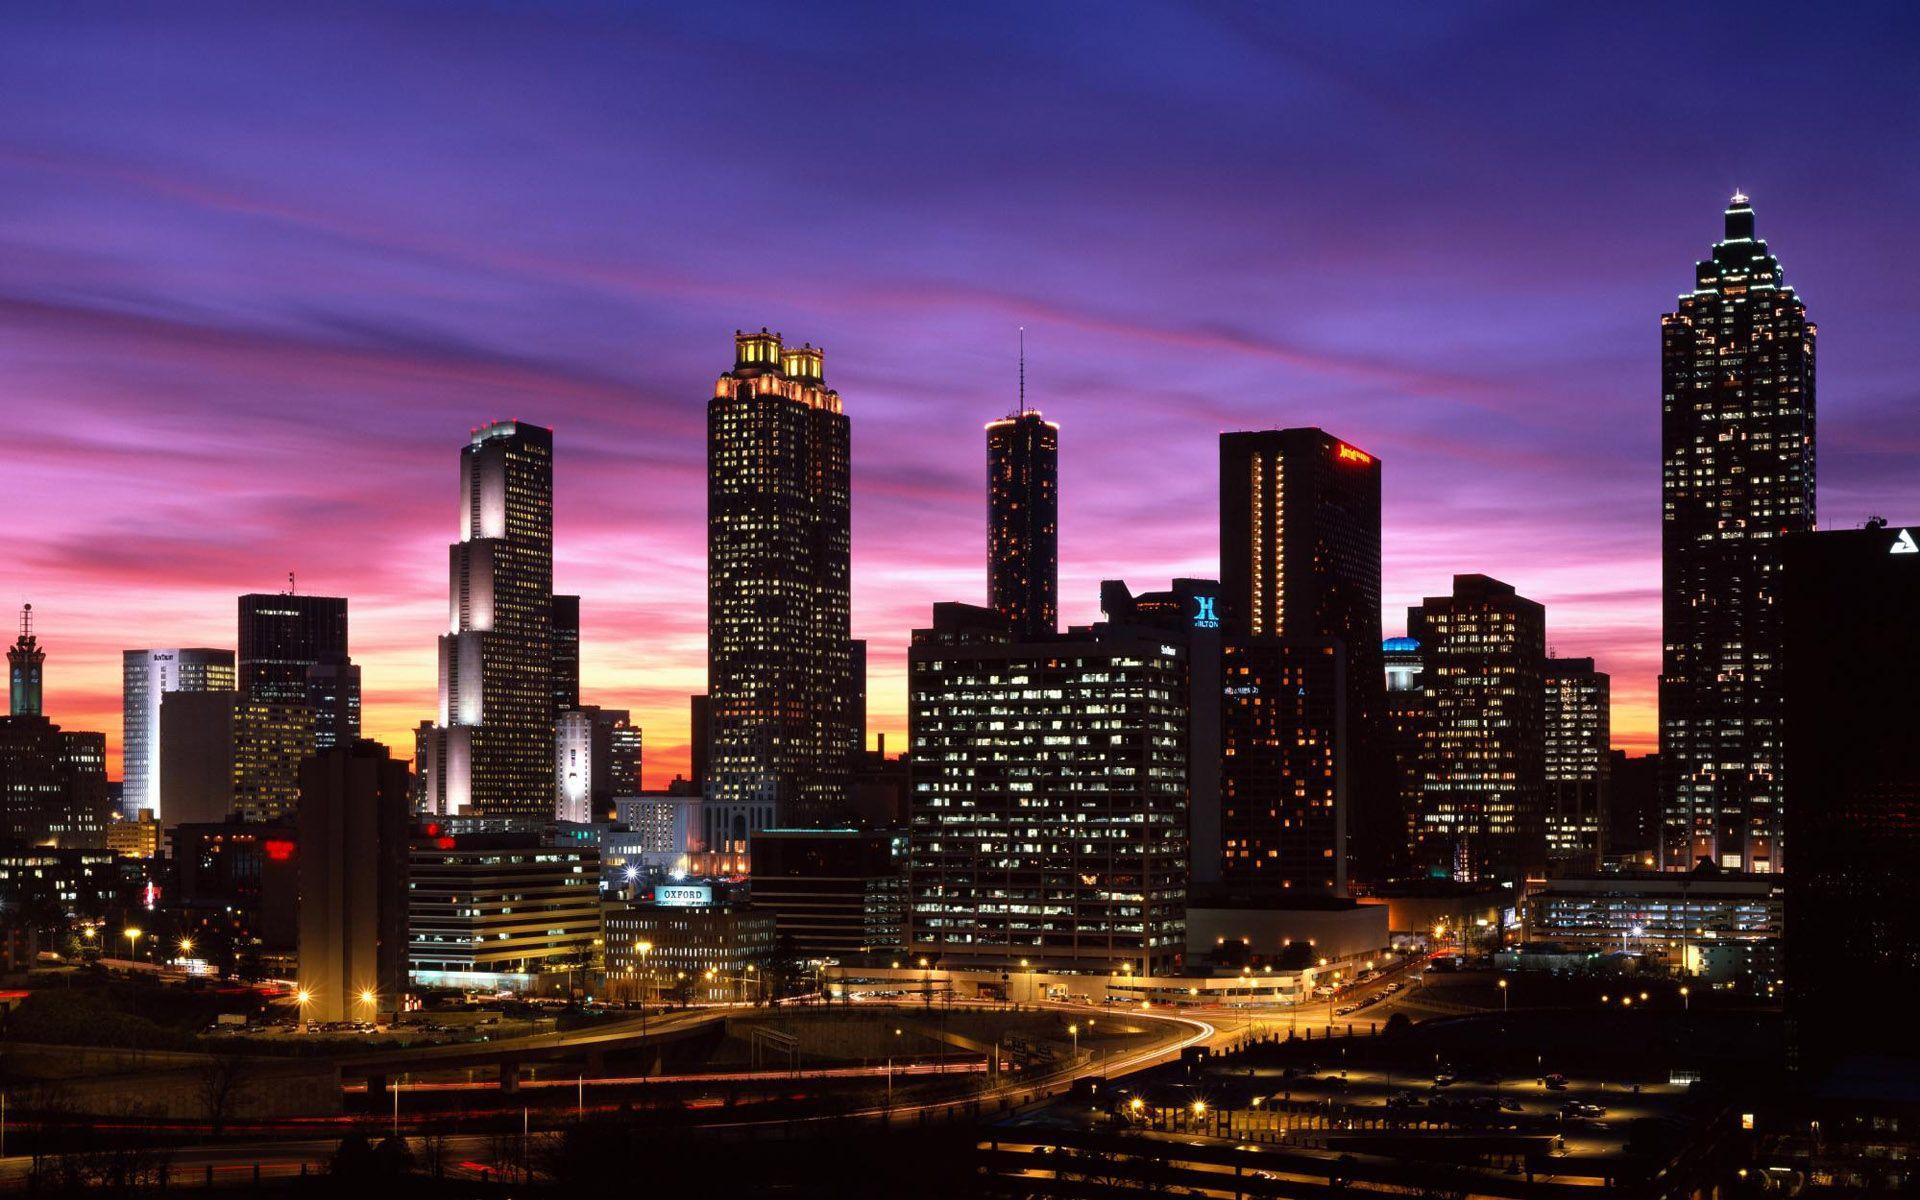 City Landscape Photography Google Search Atlanta Skyline Hotels In Atlanta Georgia Skyline